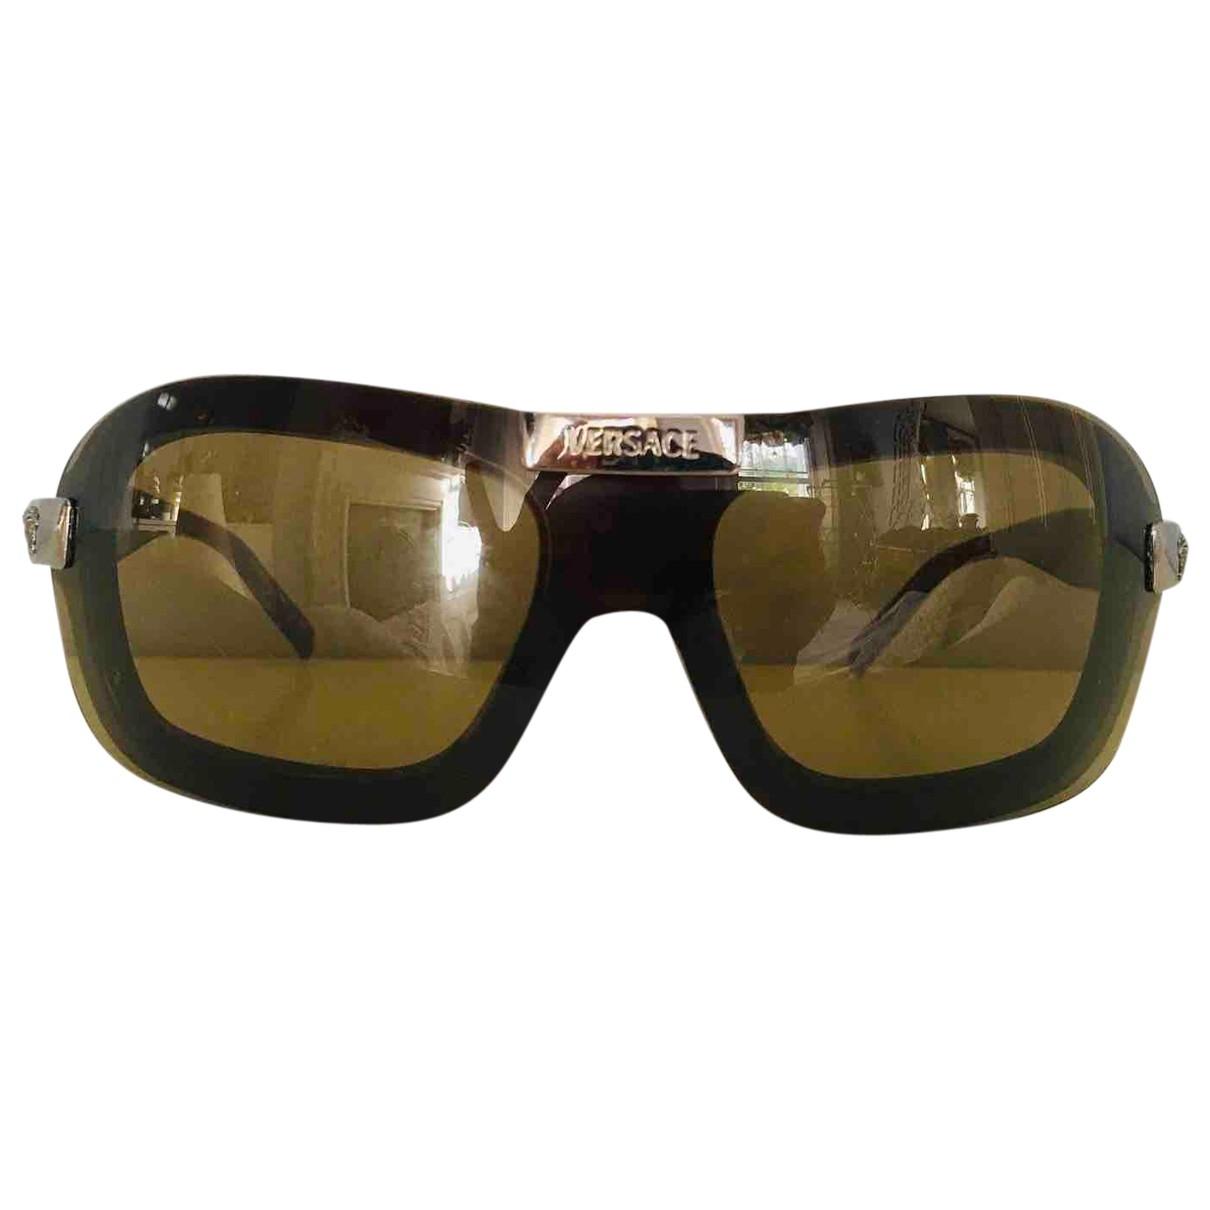 Gafas oversize Versace